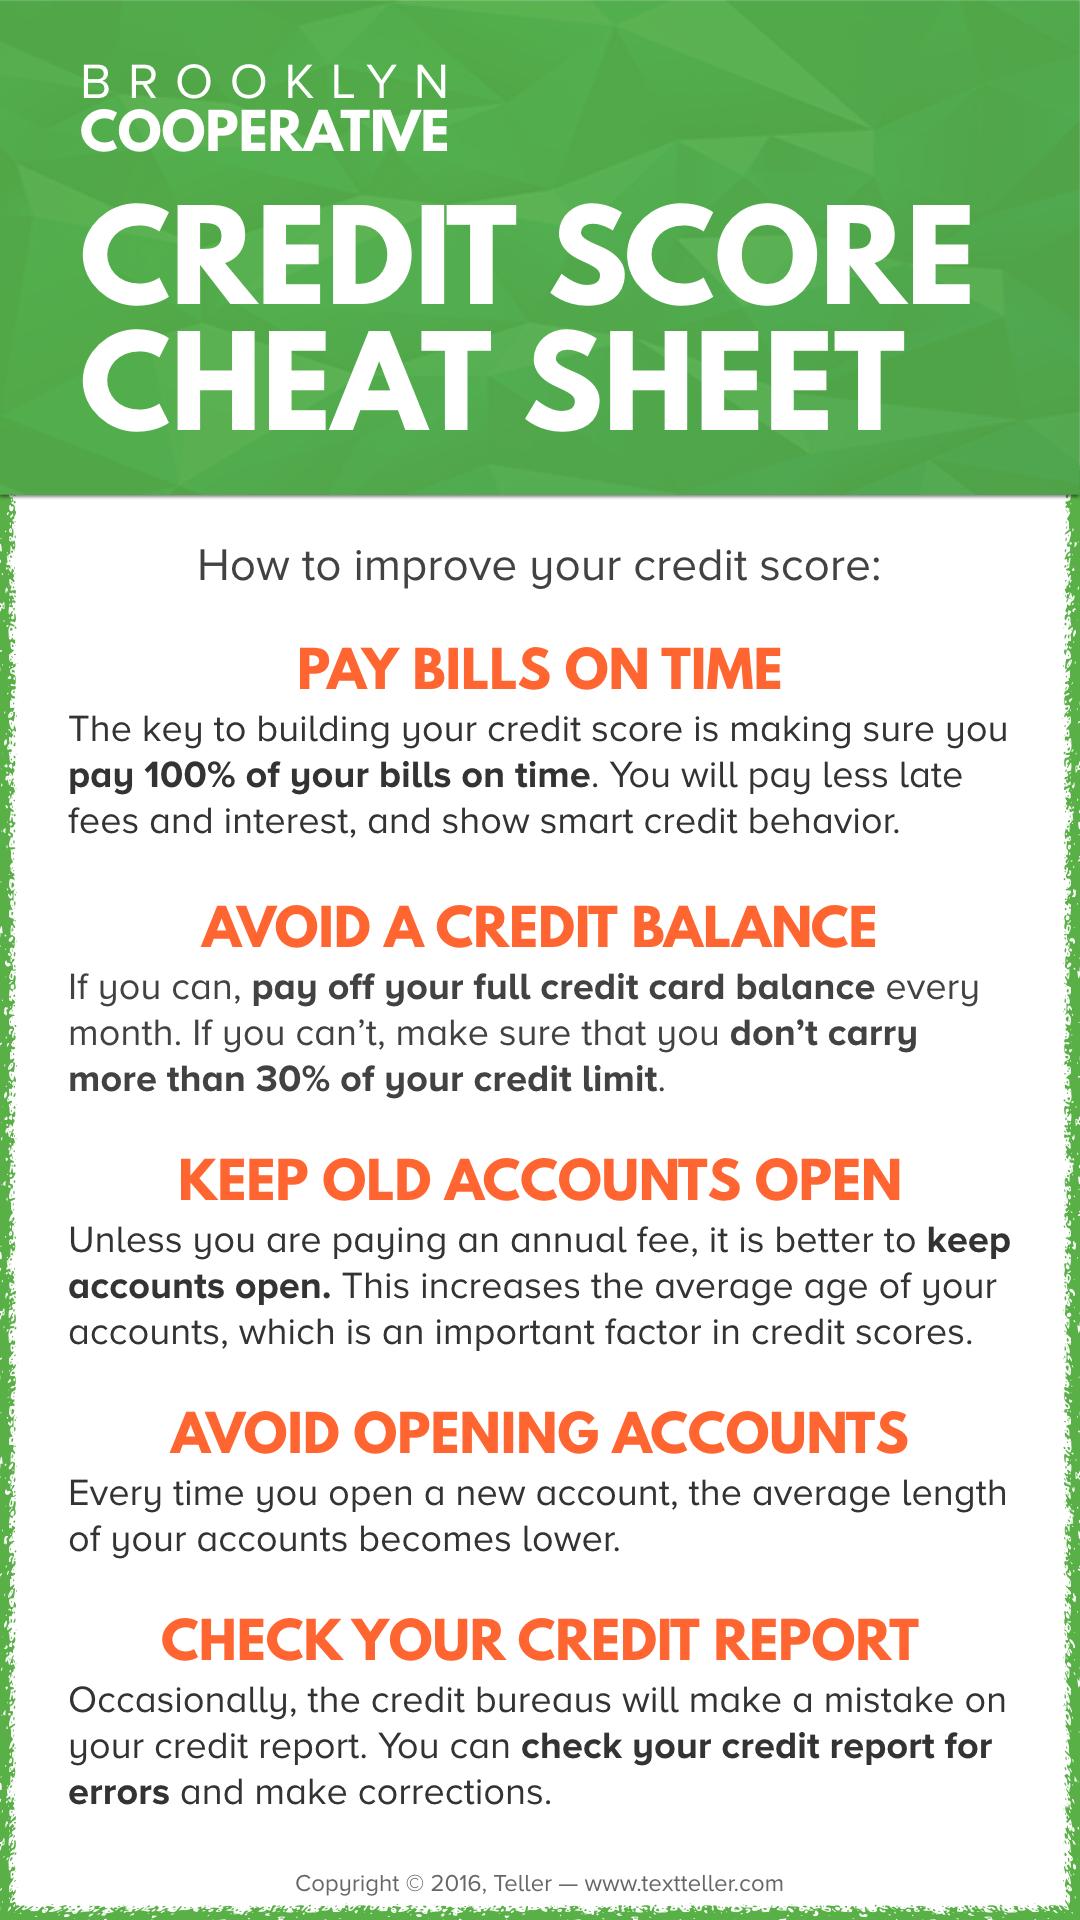 teller_credit_score_cheatsheet.png